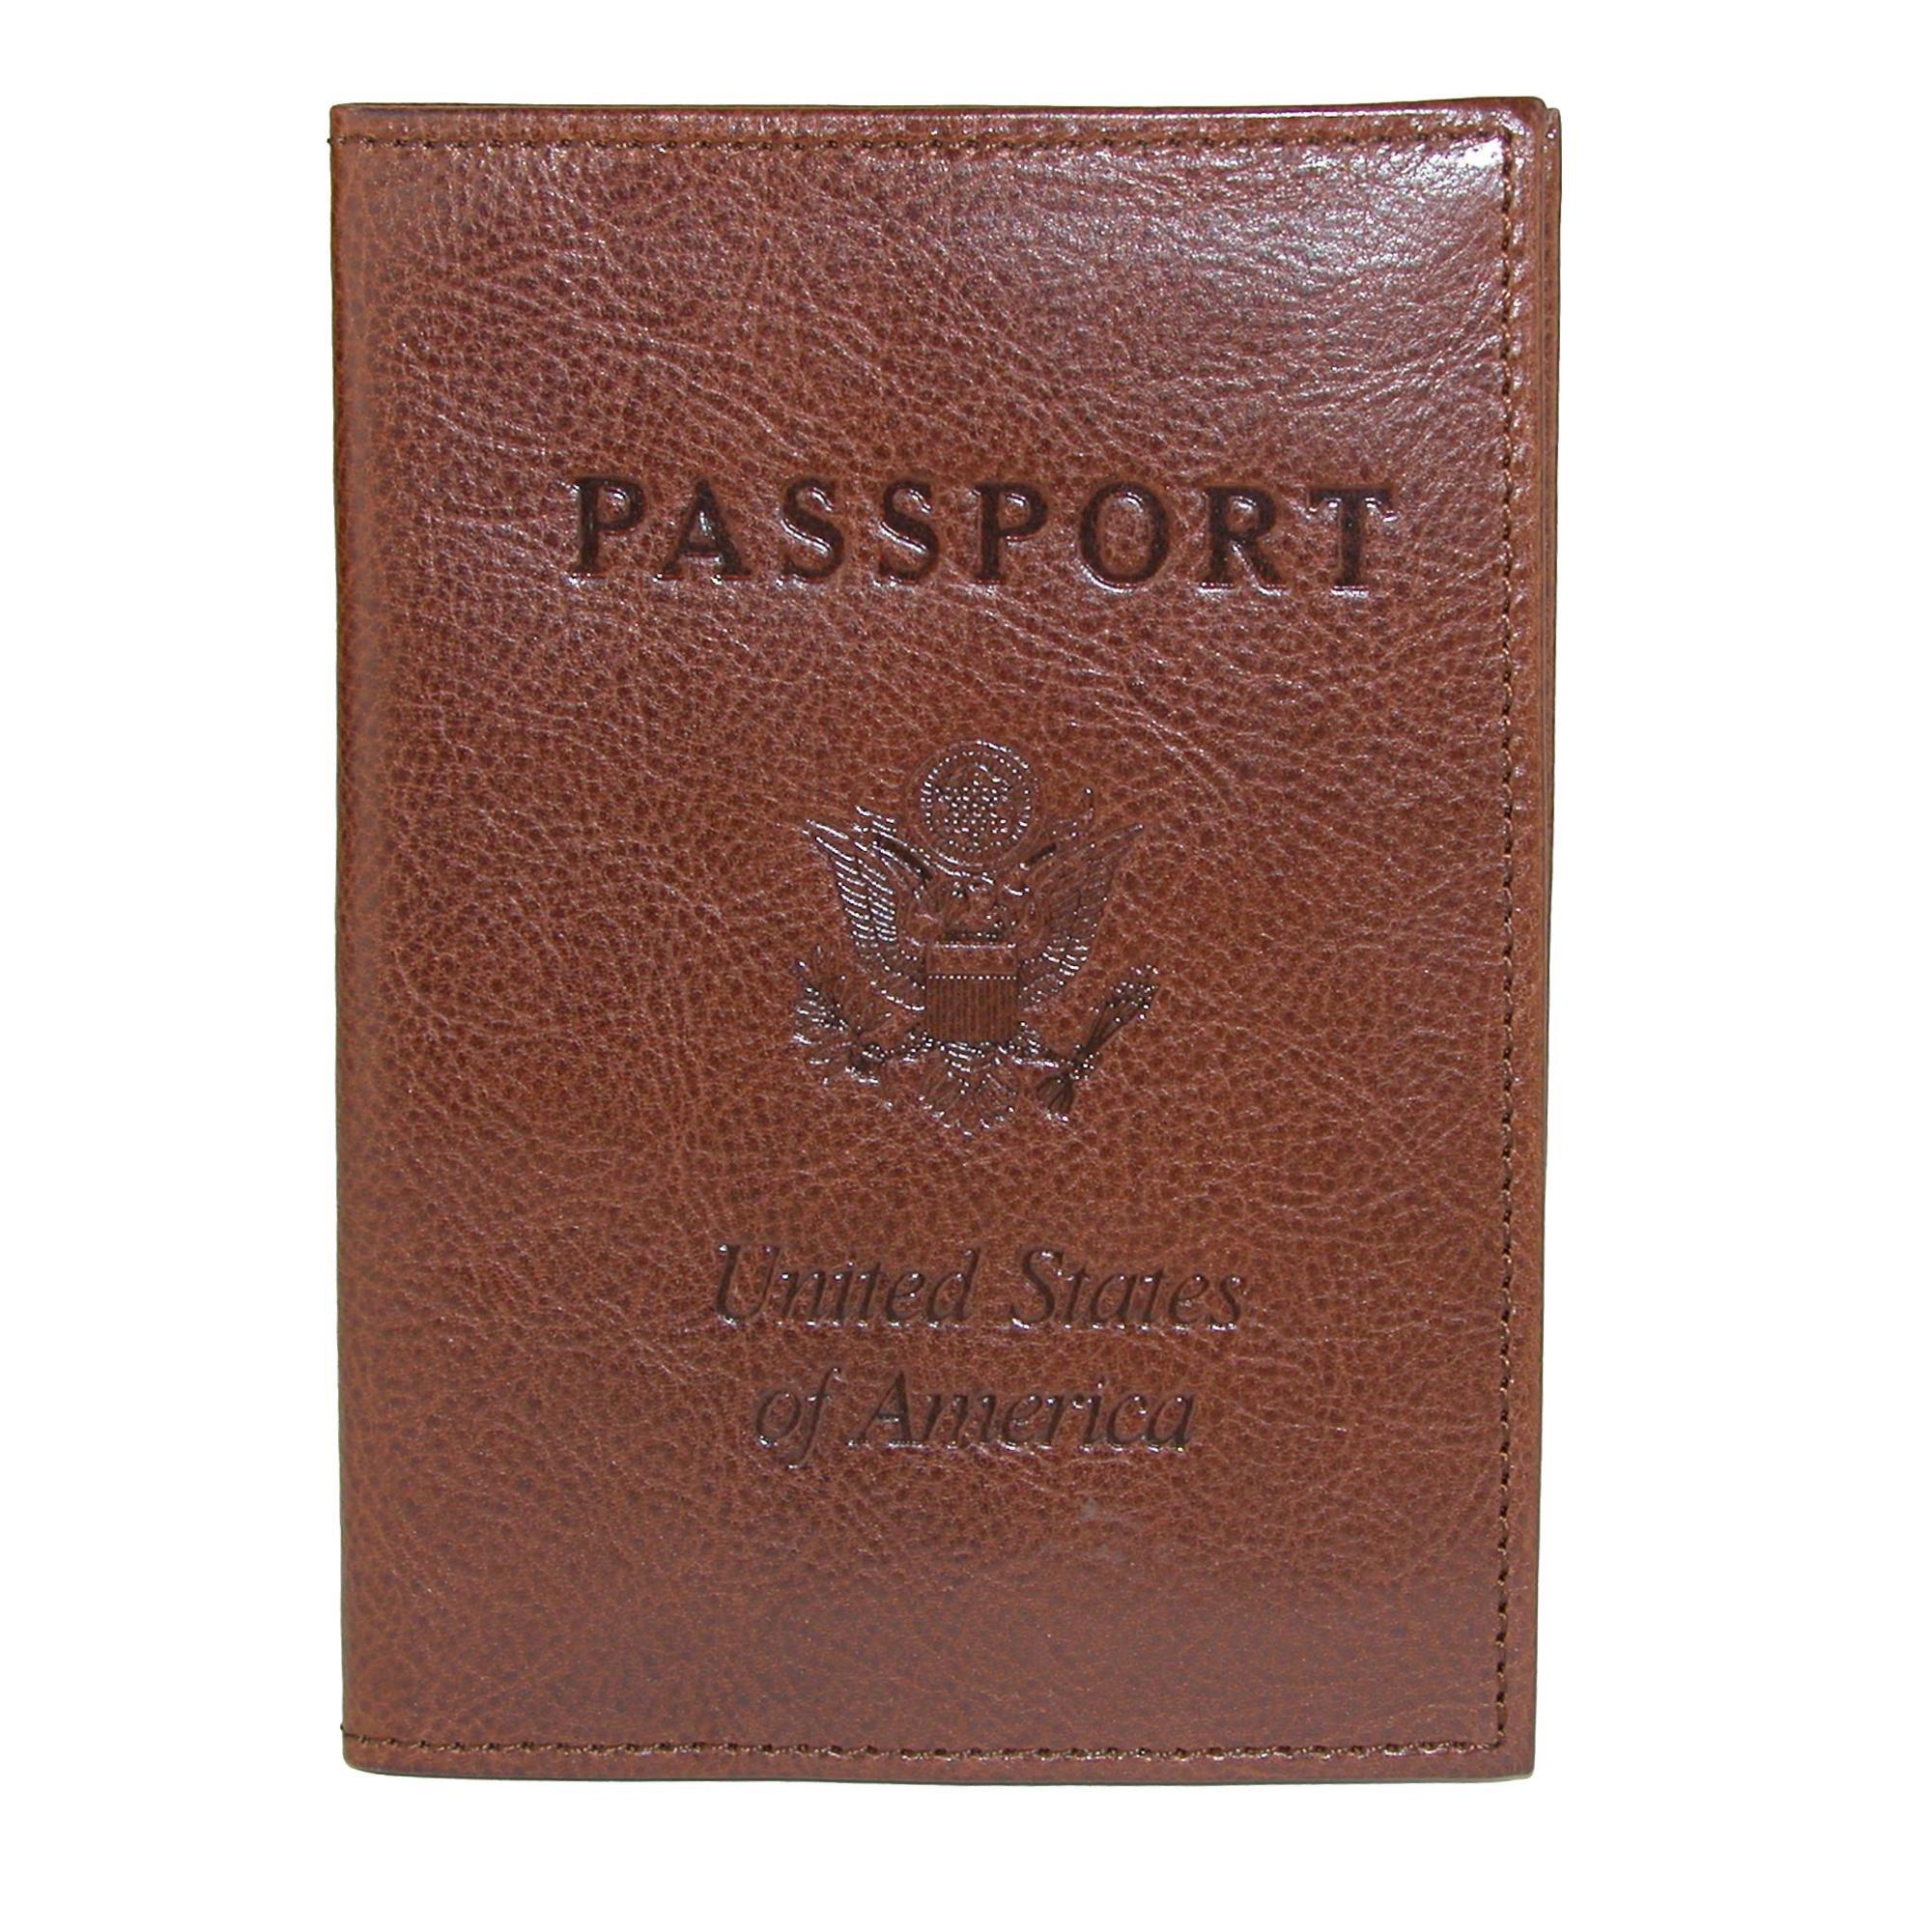 CrookhornDavis Men's Italian Vachetta Calfskin Leather Passport Cover, Brown